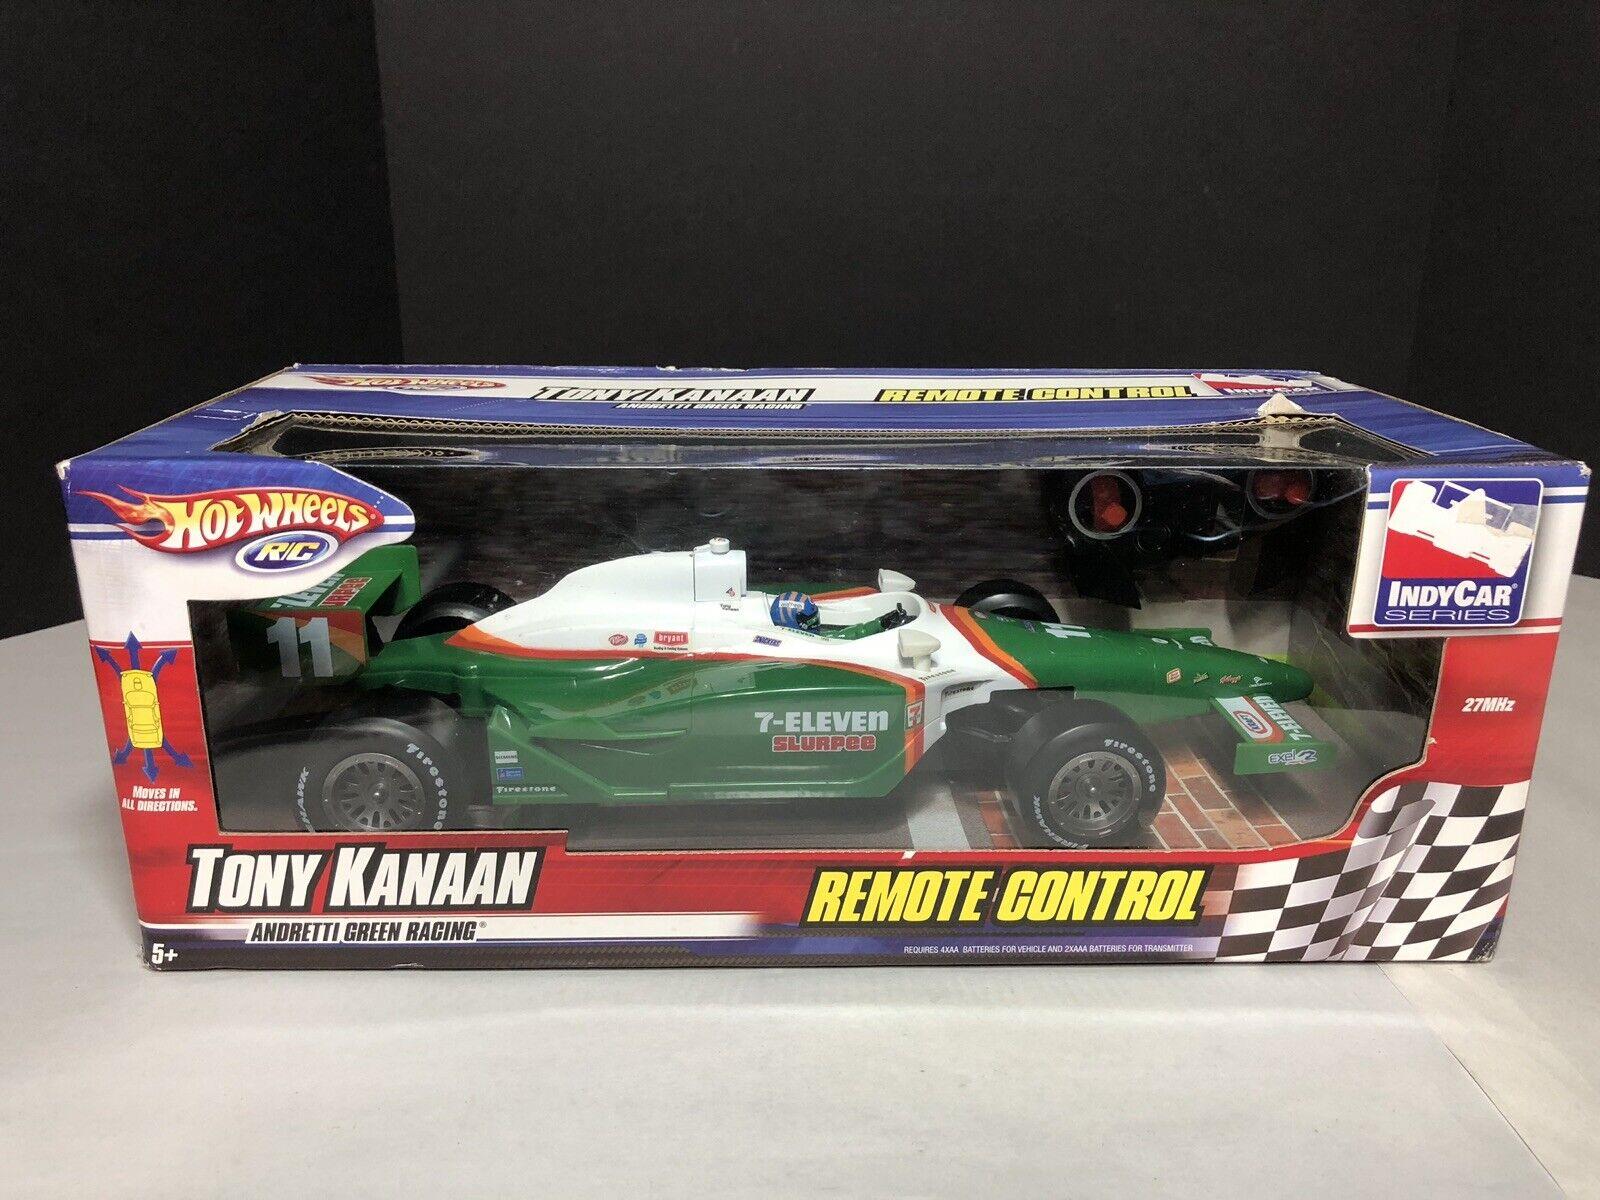 Hot Wheels Indy Car Tony Kanaan  11 Remote Control Car